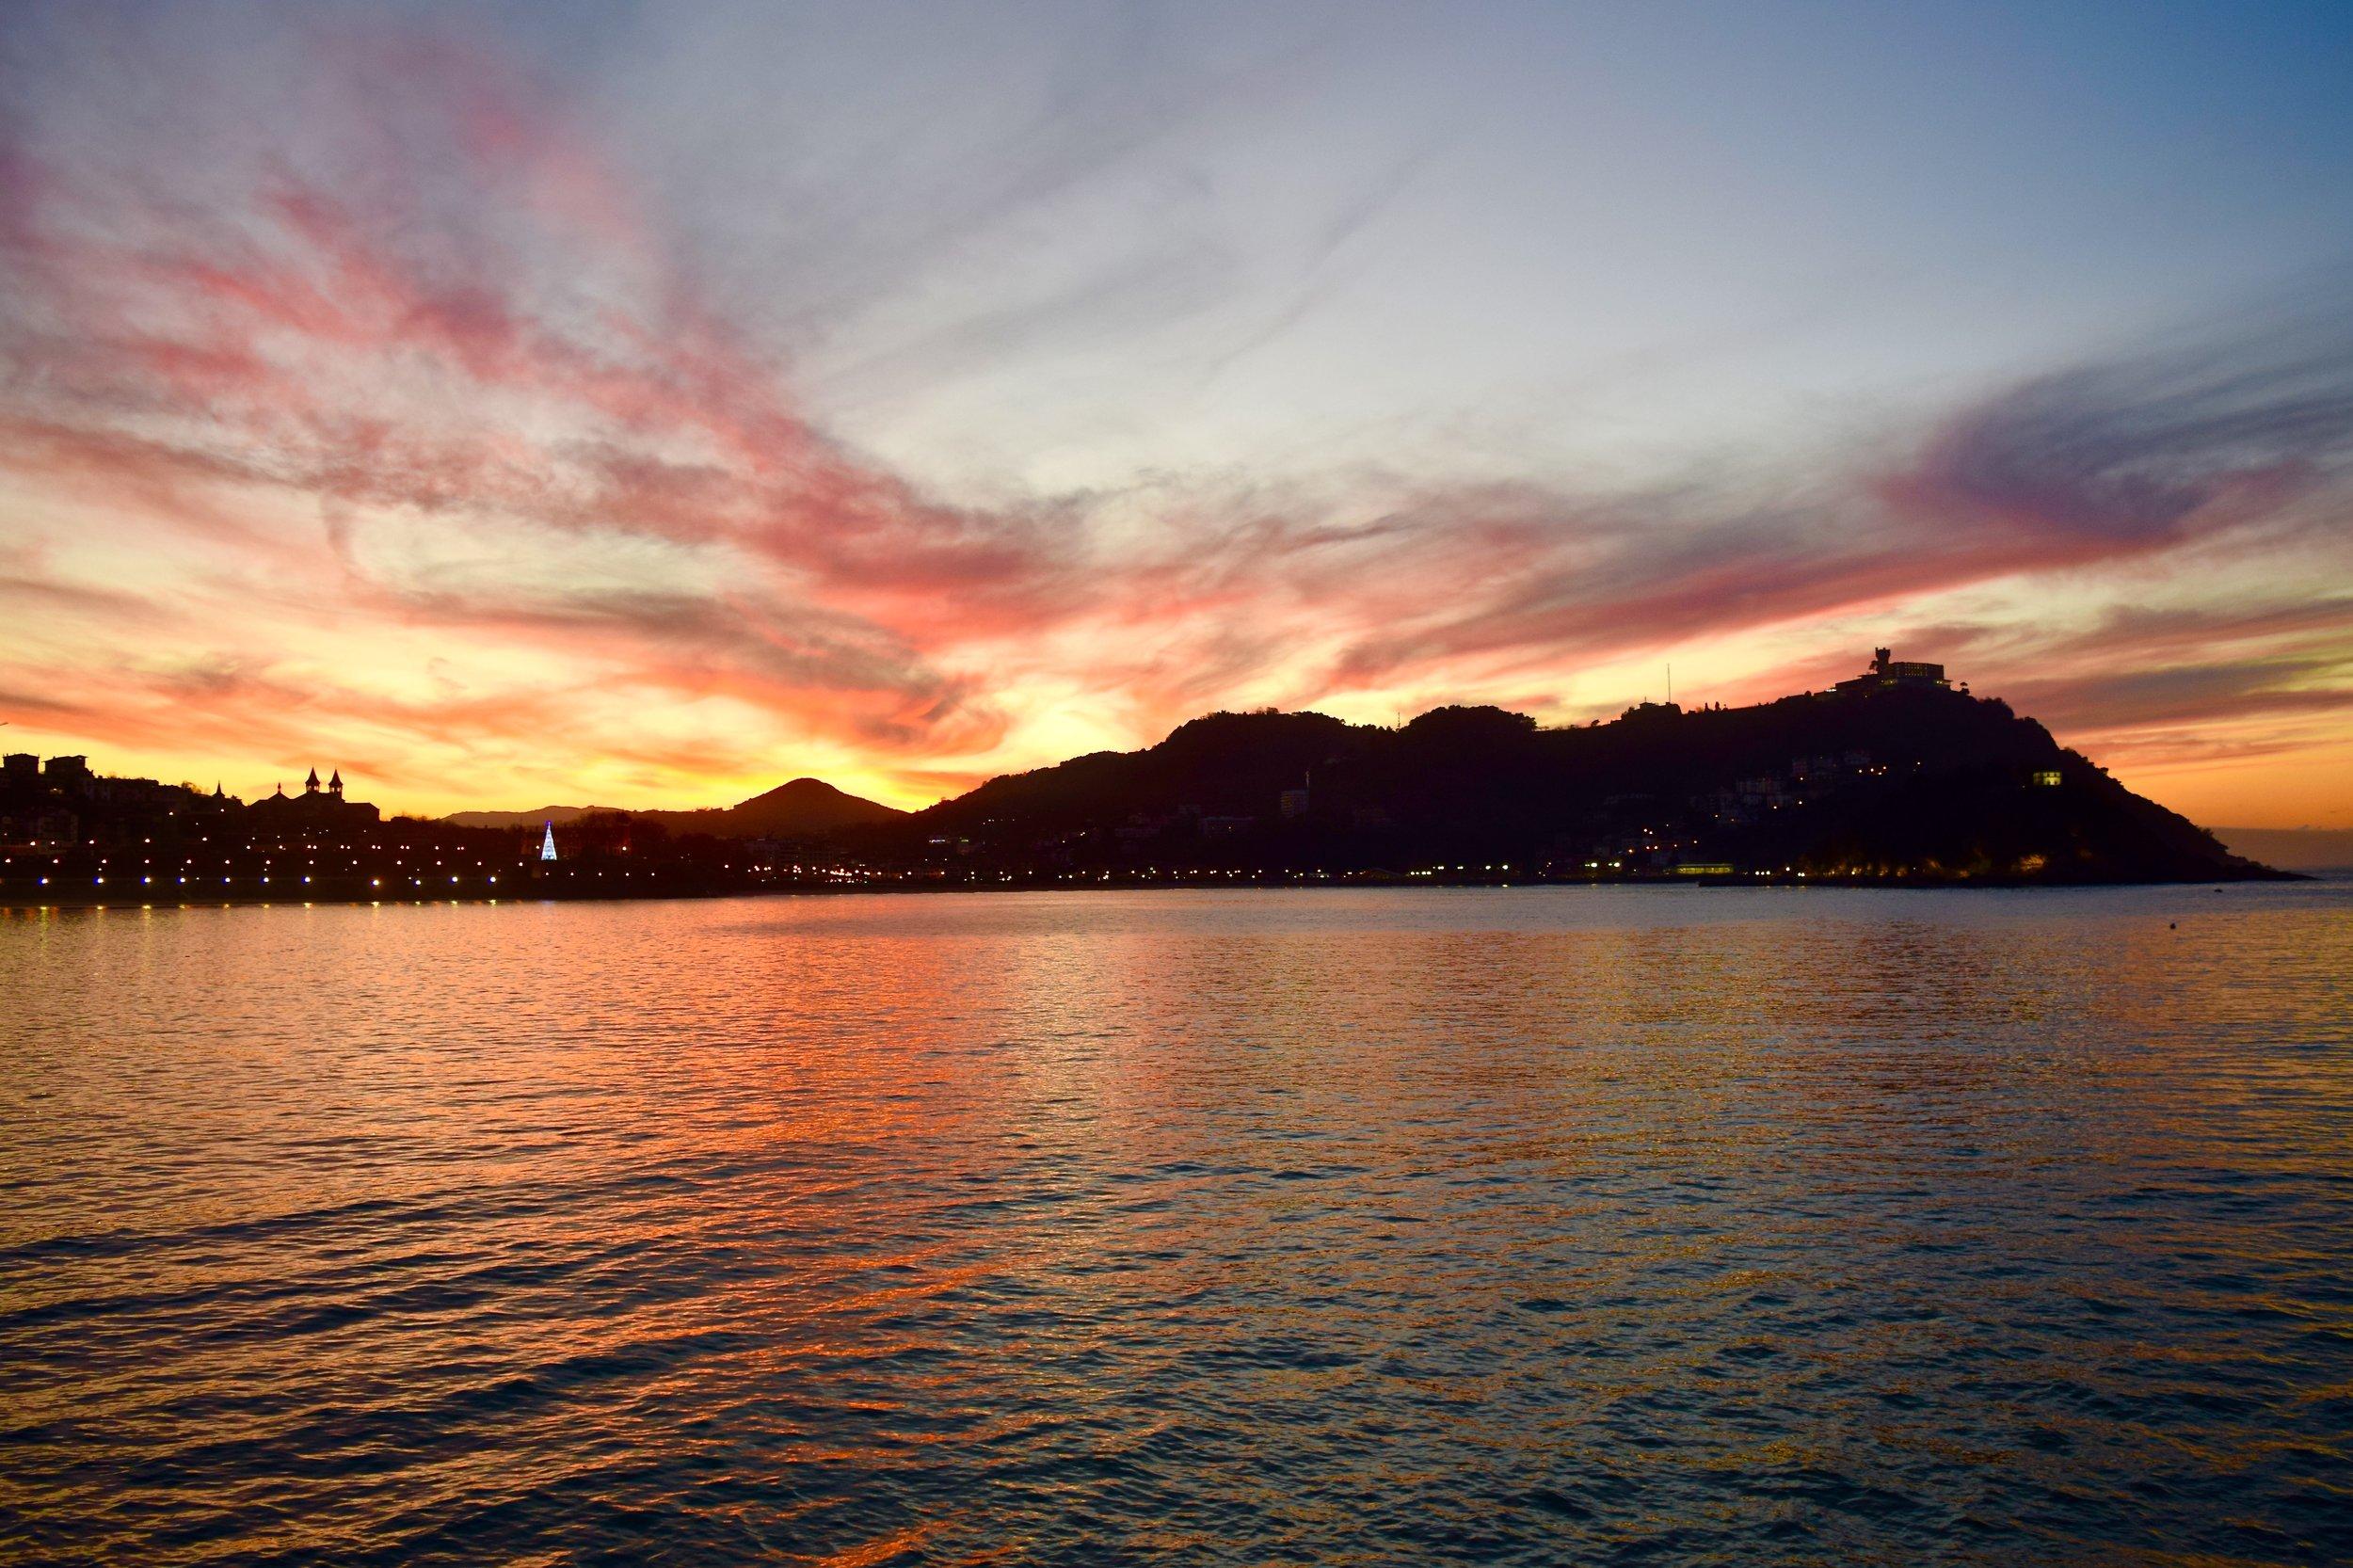 Sunset at Beach of La Concha